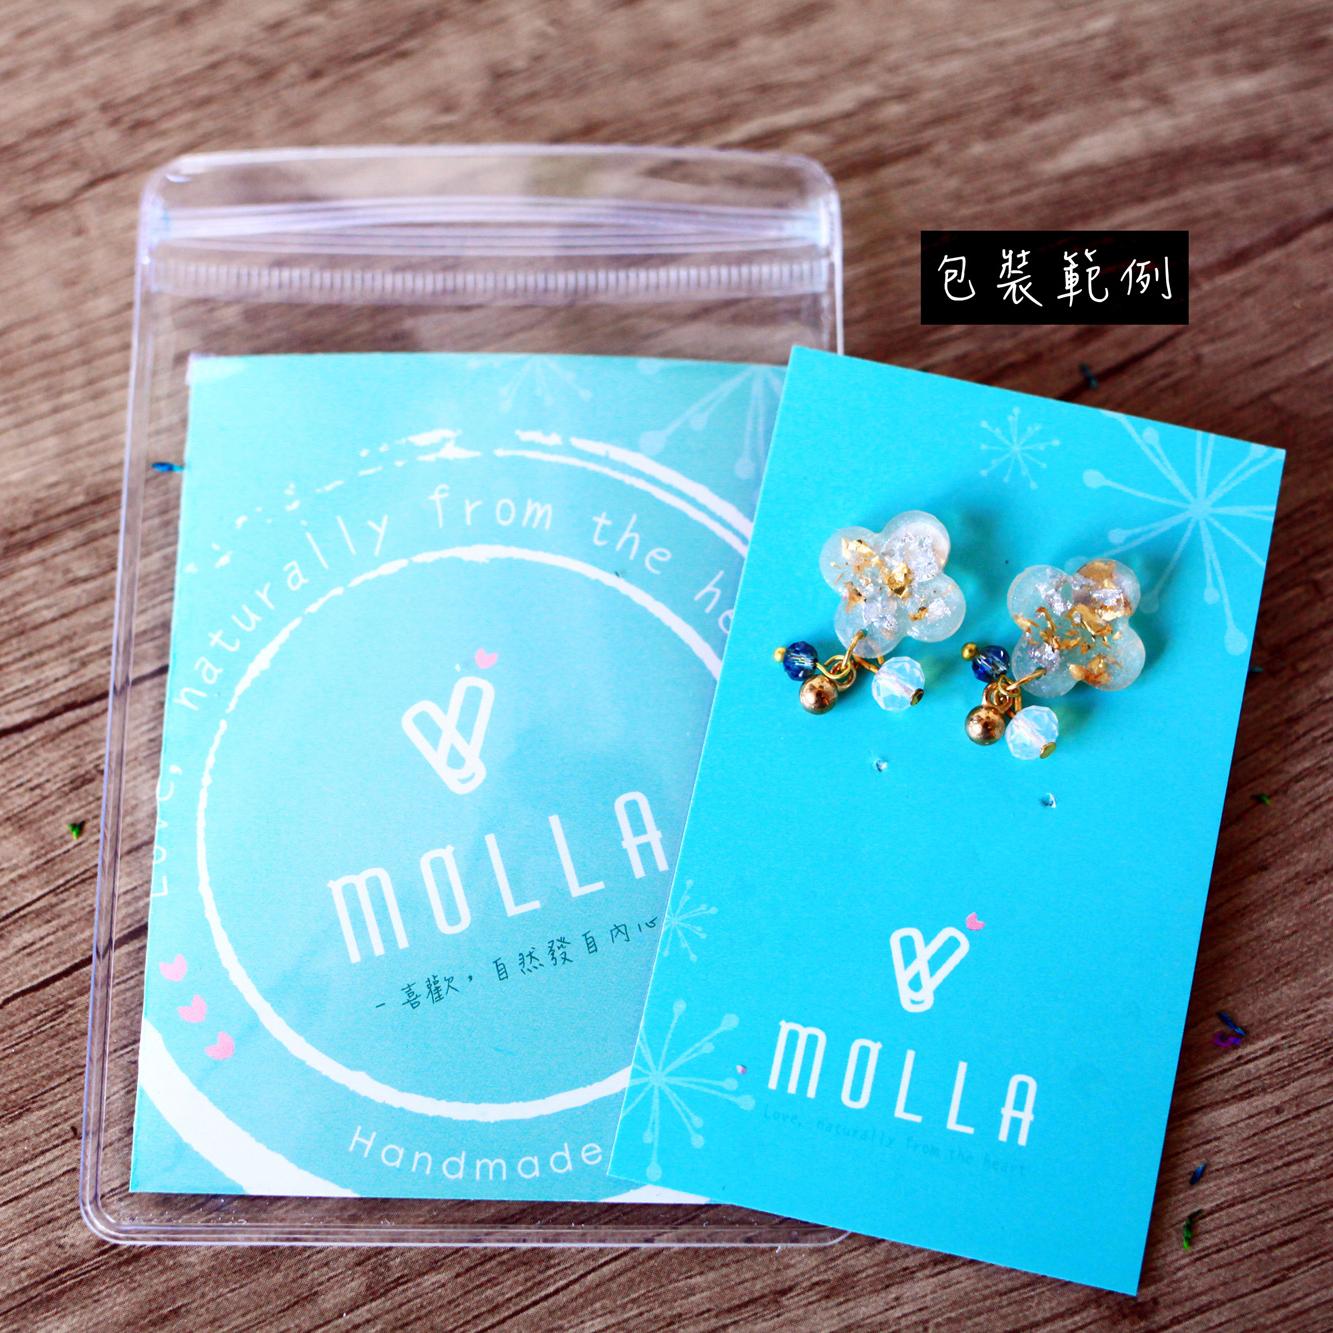 Molla 果綠箔金半圓兩用耳環(純銀針耳環-手工訂製)